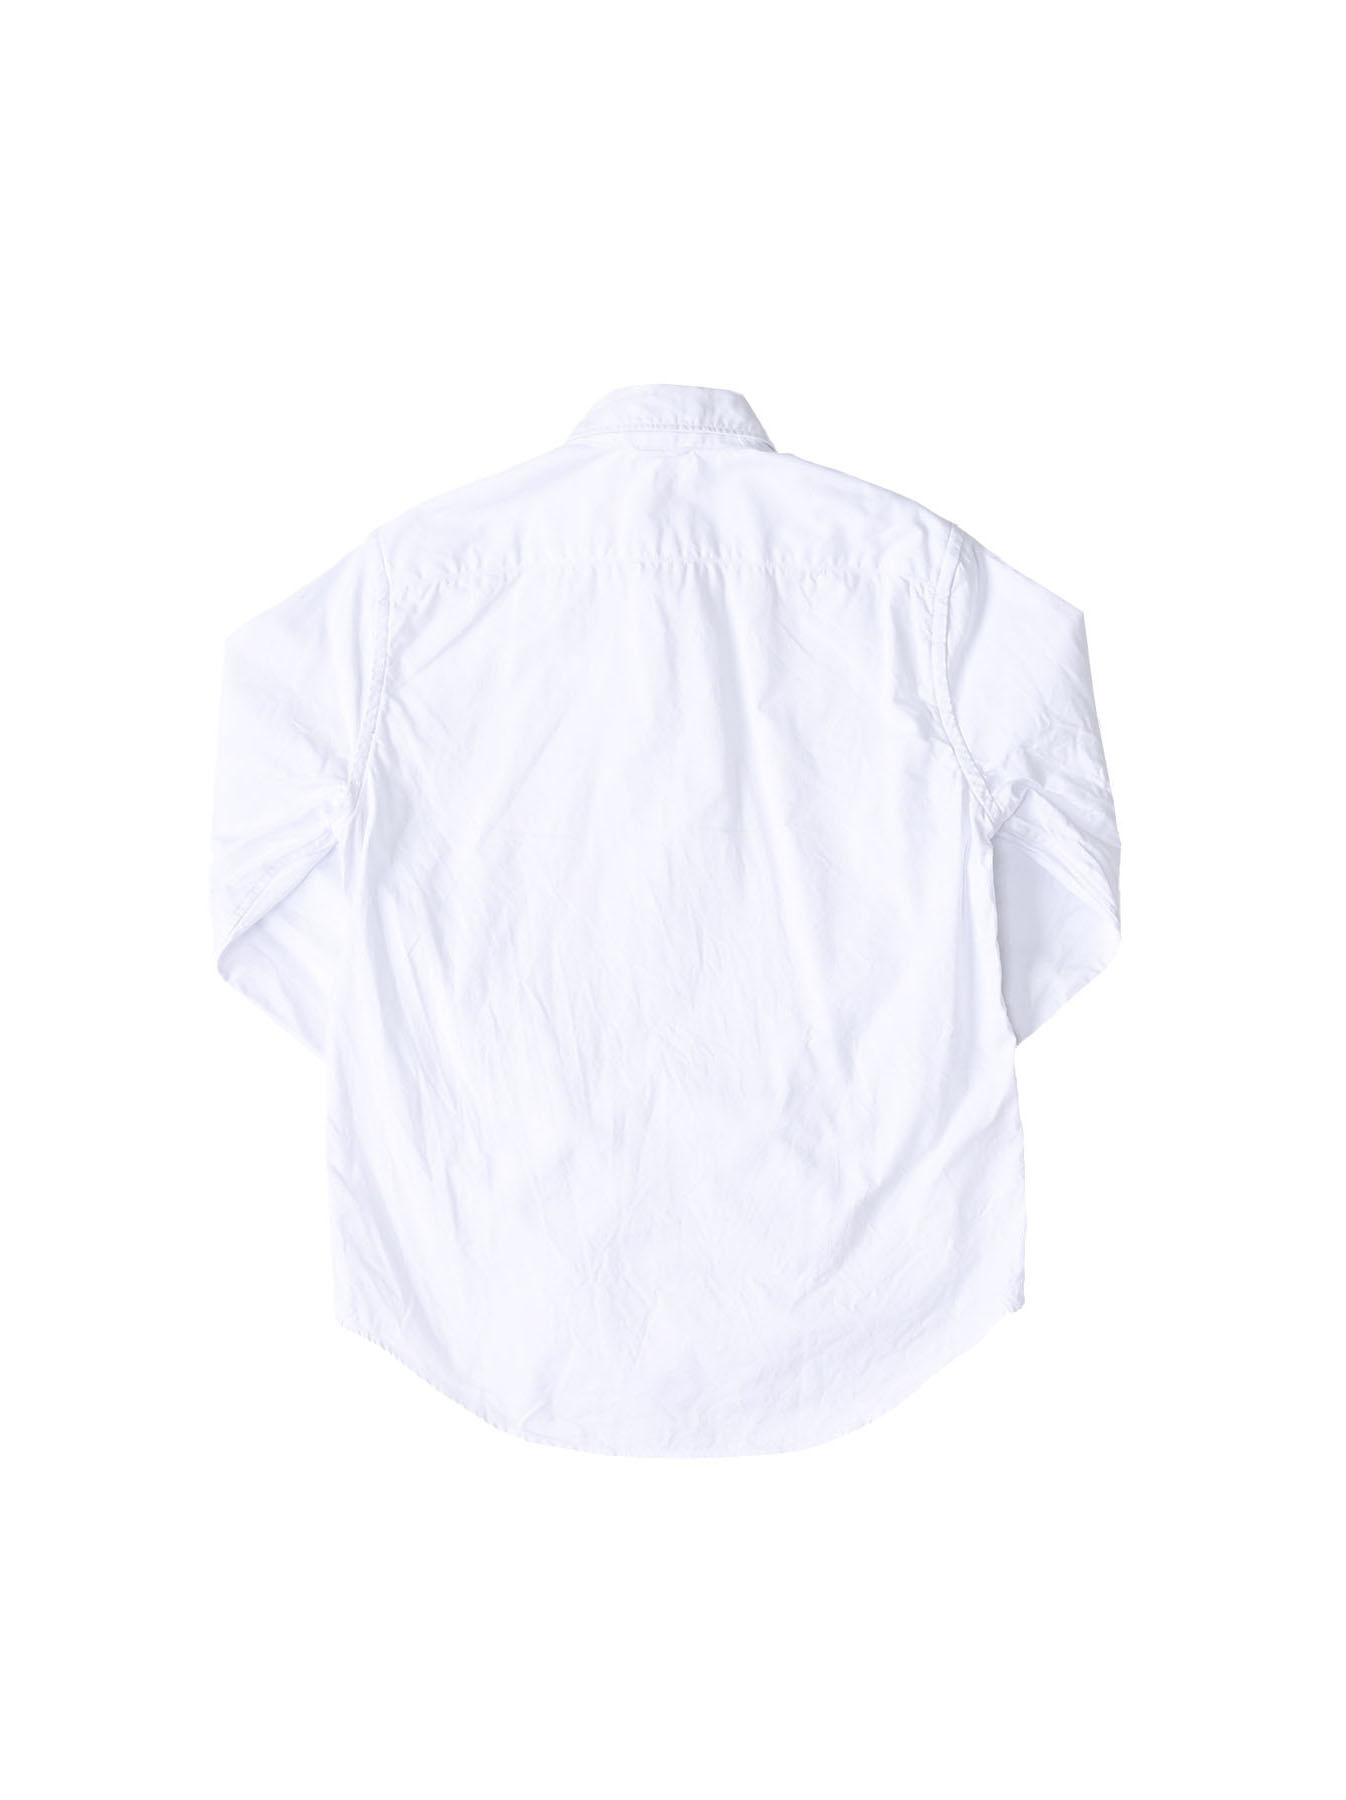 Zimbabwe Oxford 908 Regular Shirt-10